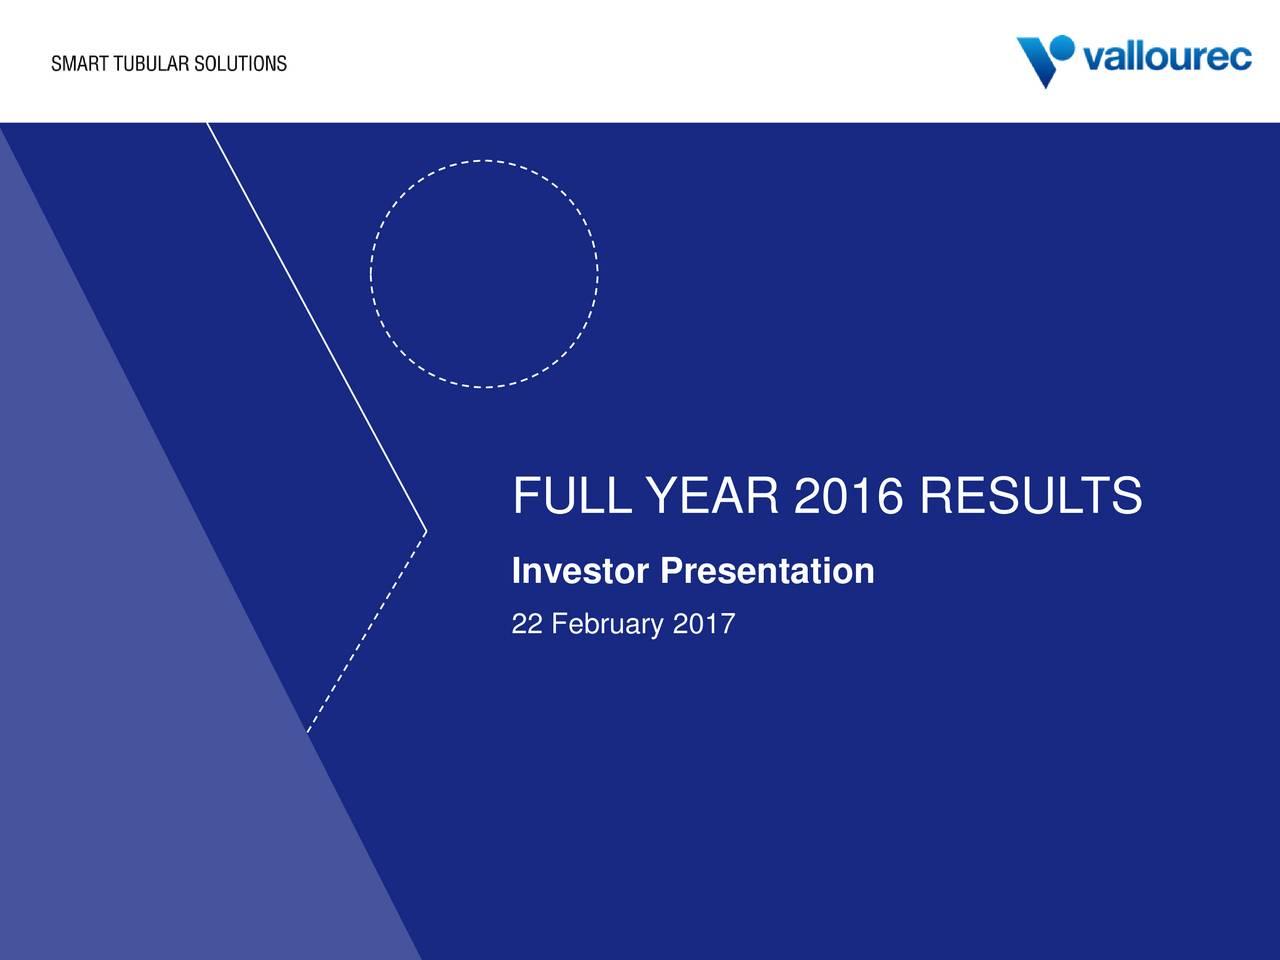 Investor Presentation 22 February 2017